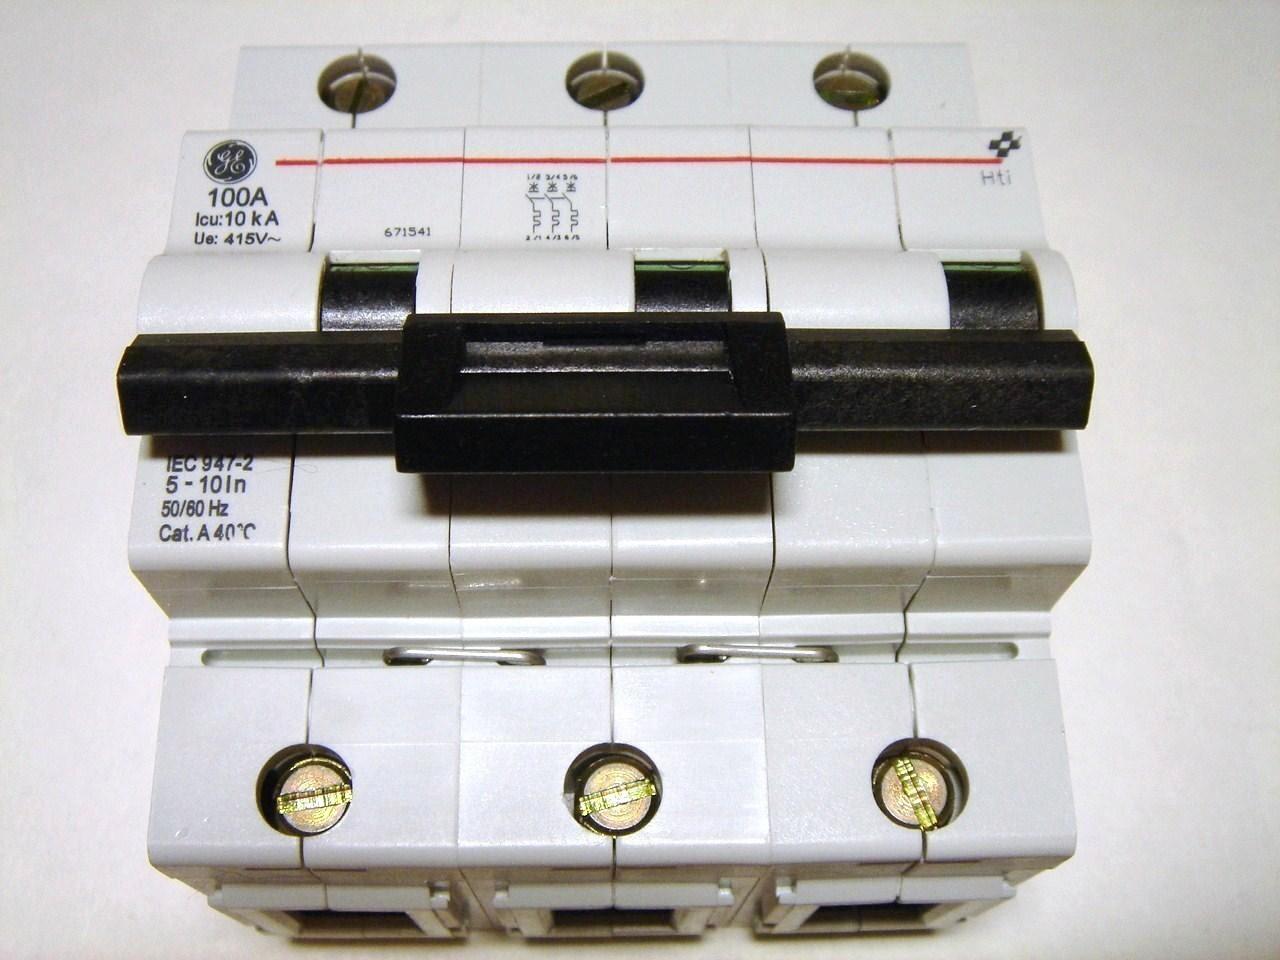 Moodulkaitselüliti 3-faasiline, C 100A, General Electric, HTI103C100, 671541